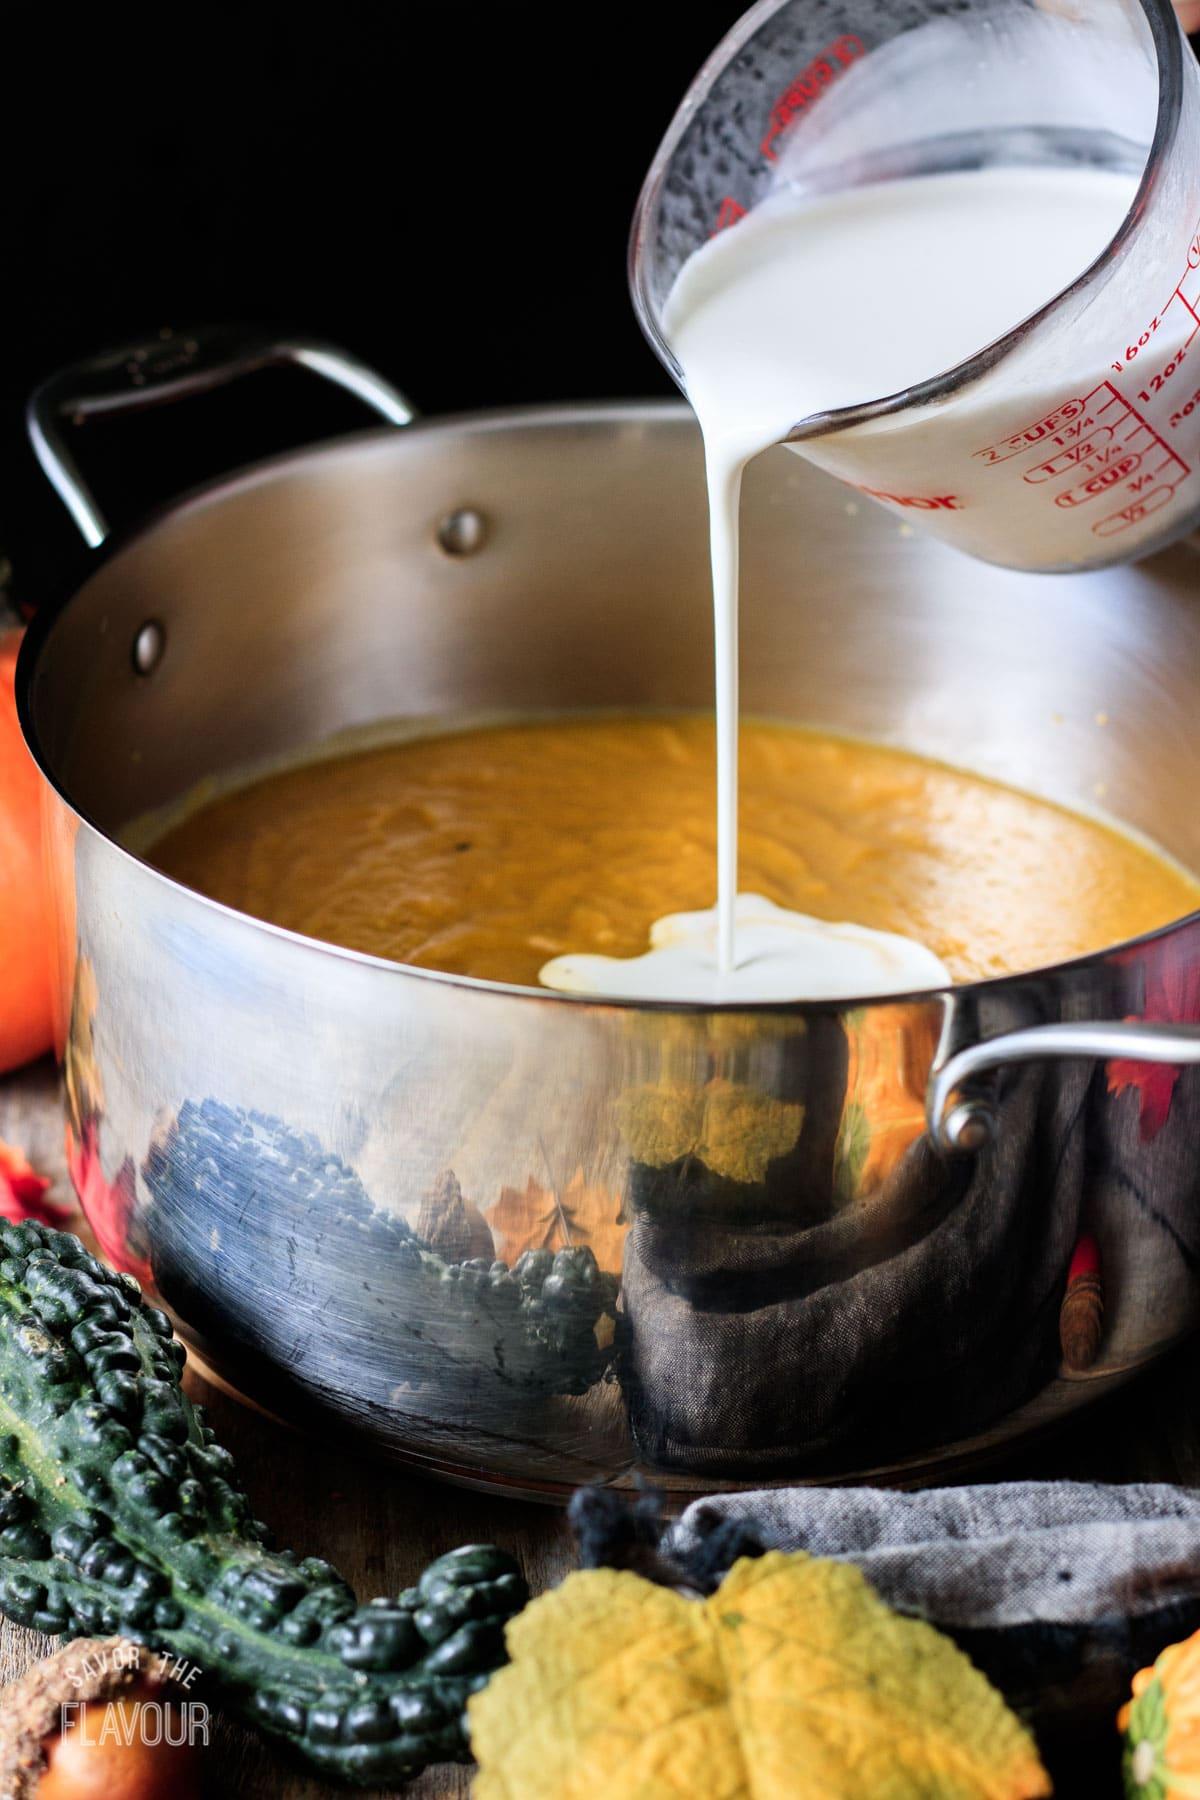 pouring the coconut milk into the pot of pumpkin sweet potato soup